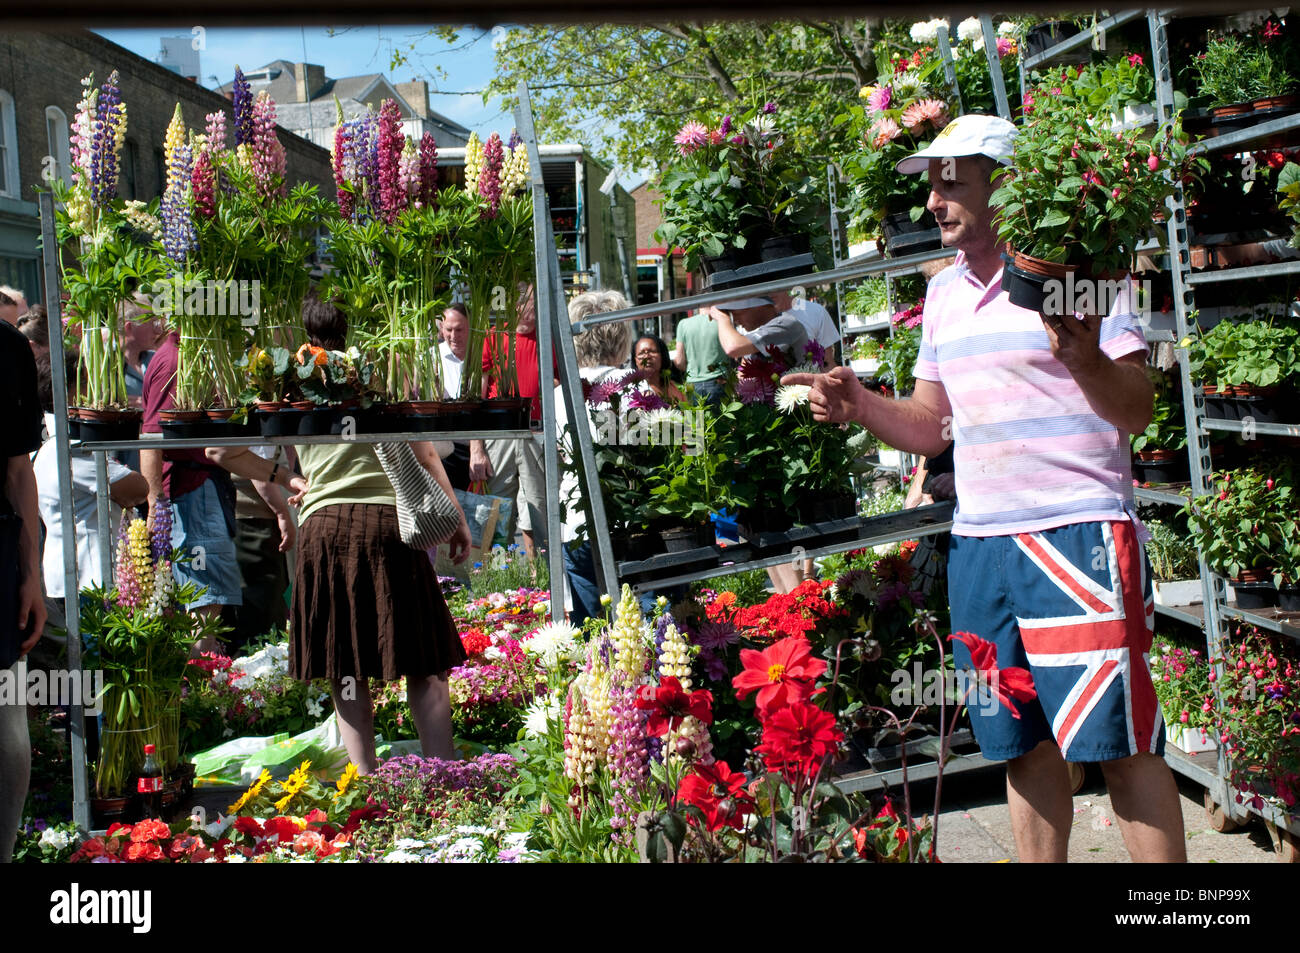 Vendeur montrant ses marchandises, Columbia Road Flower Market, London, E2, England, UK Photo Stock